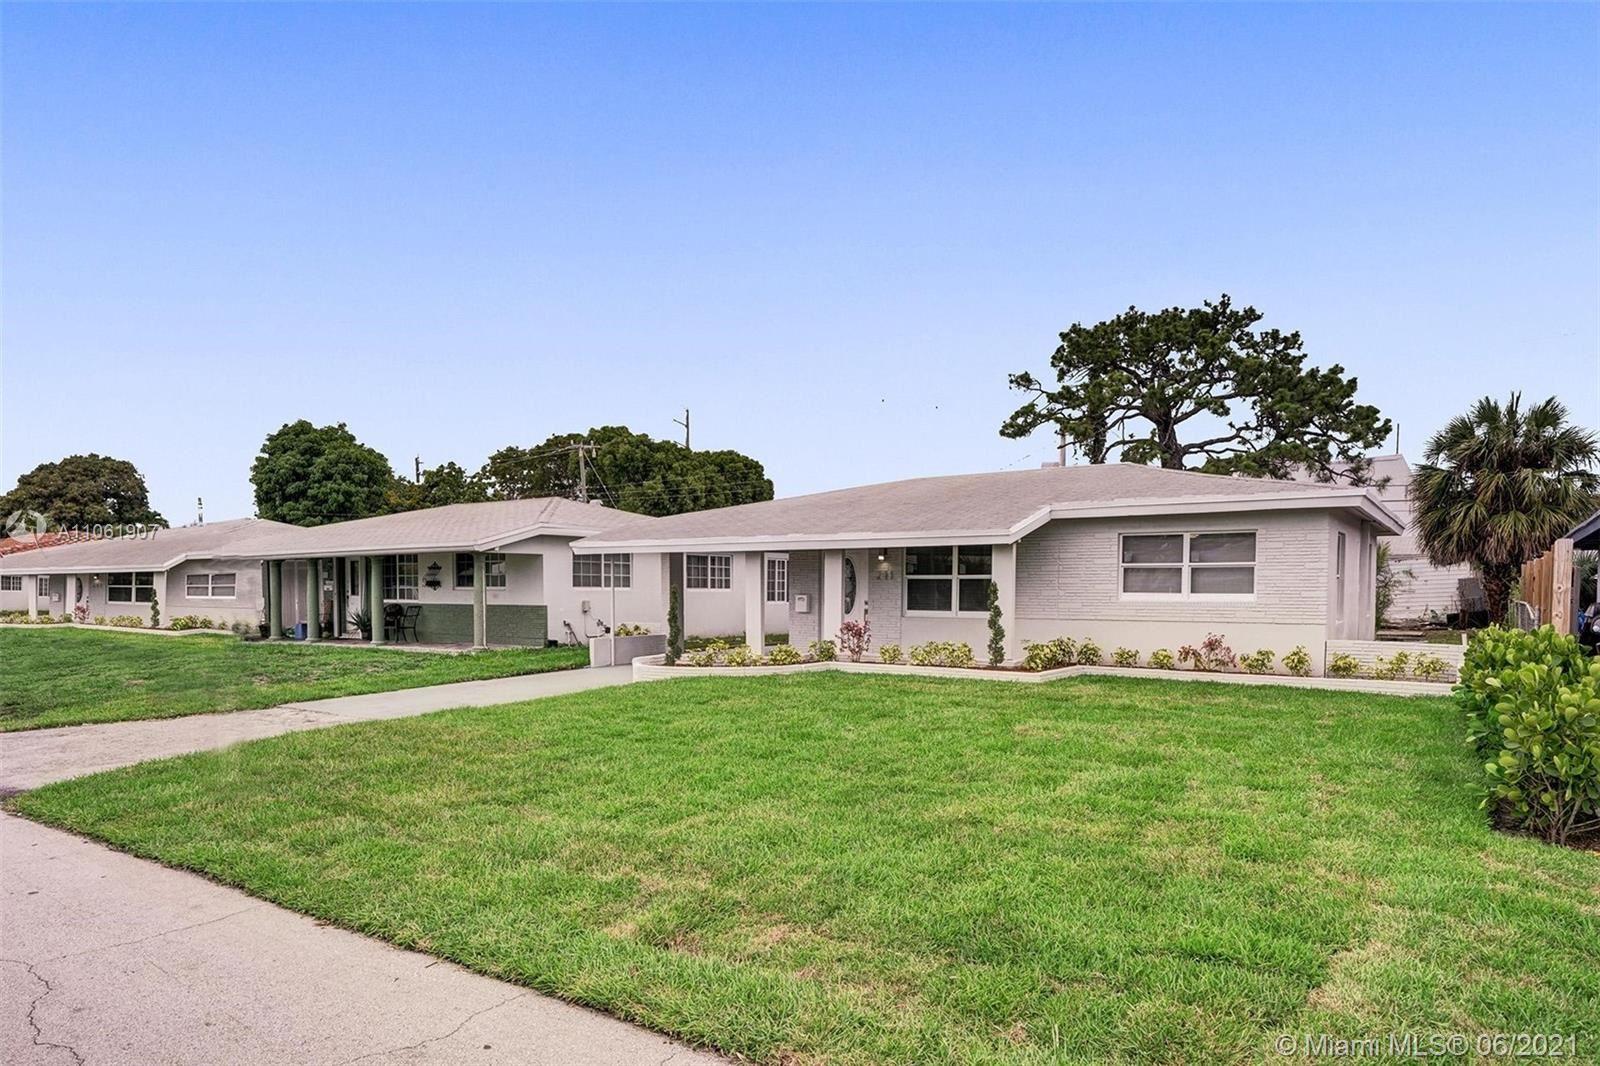 271 NE 43rd Ct, Oakland Park, FL 33334 - #: A11061907